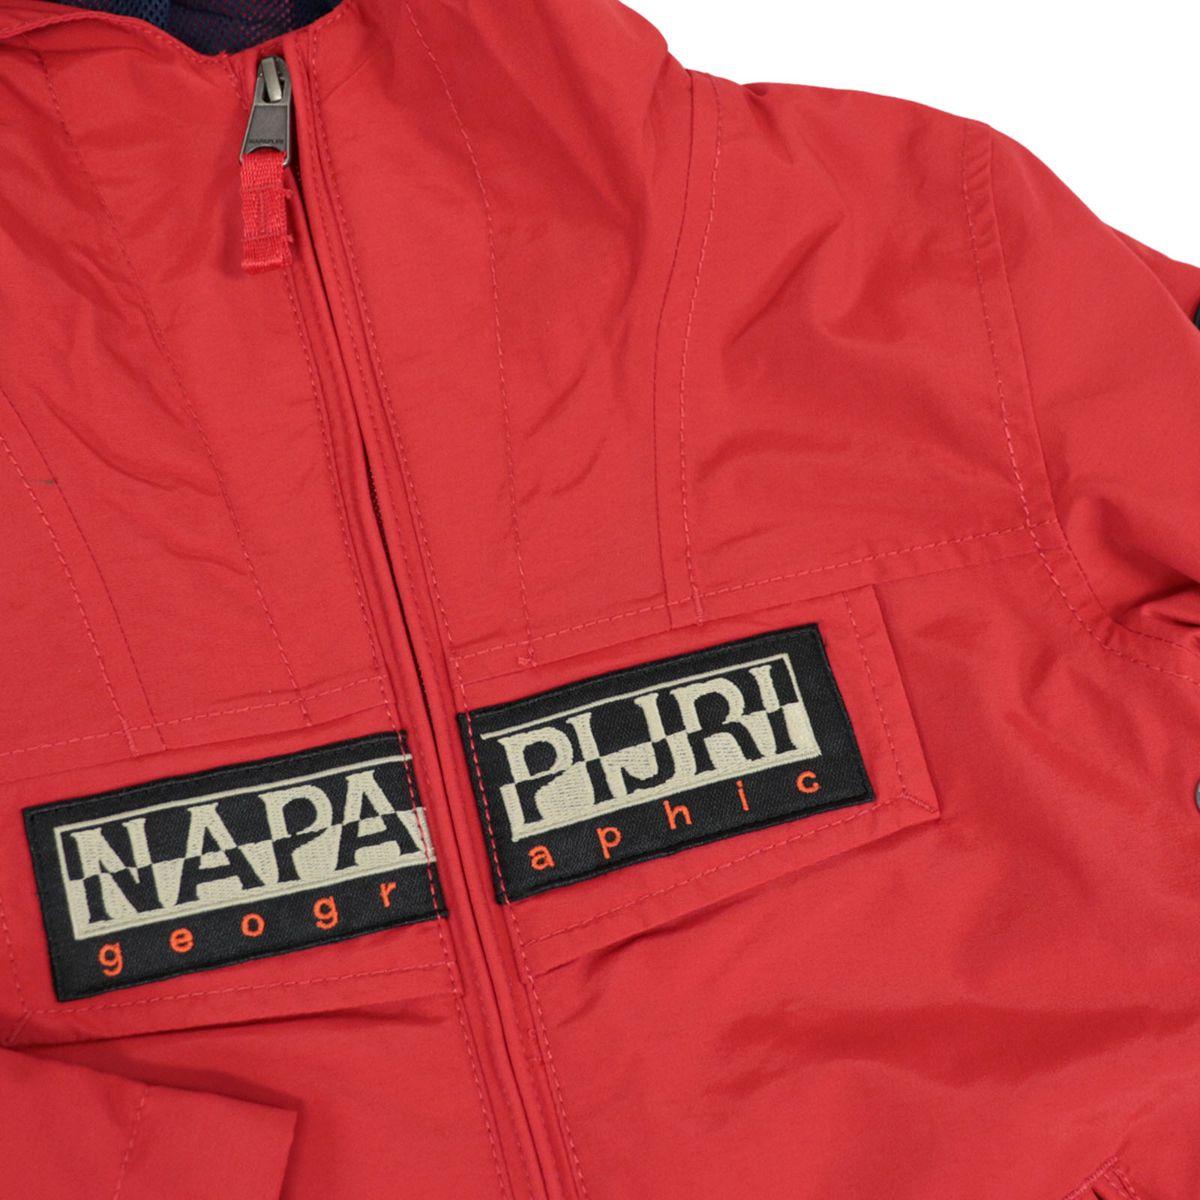 K Rainforest S OP 2 nylon jacket with hood and logo Red NAPAPIJRI